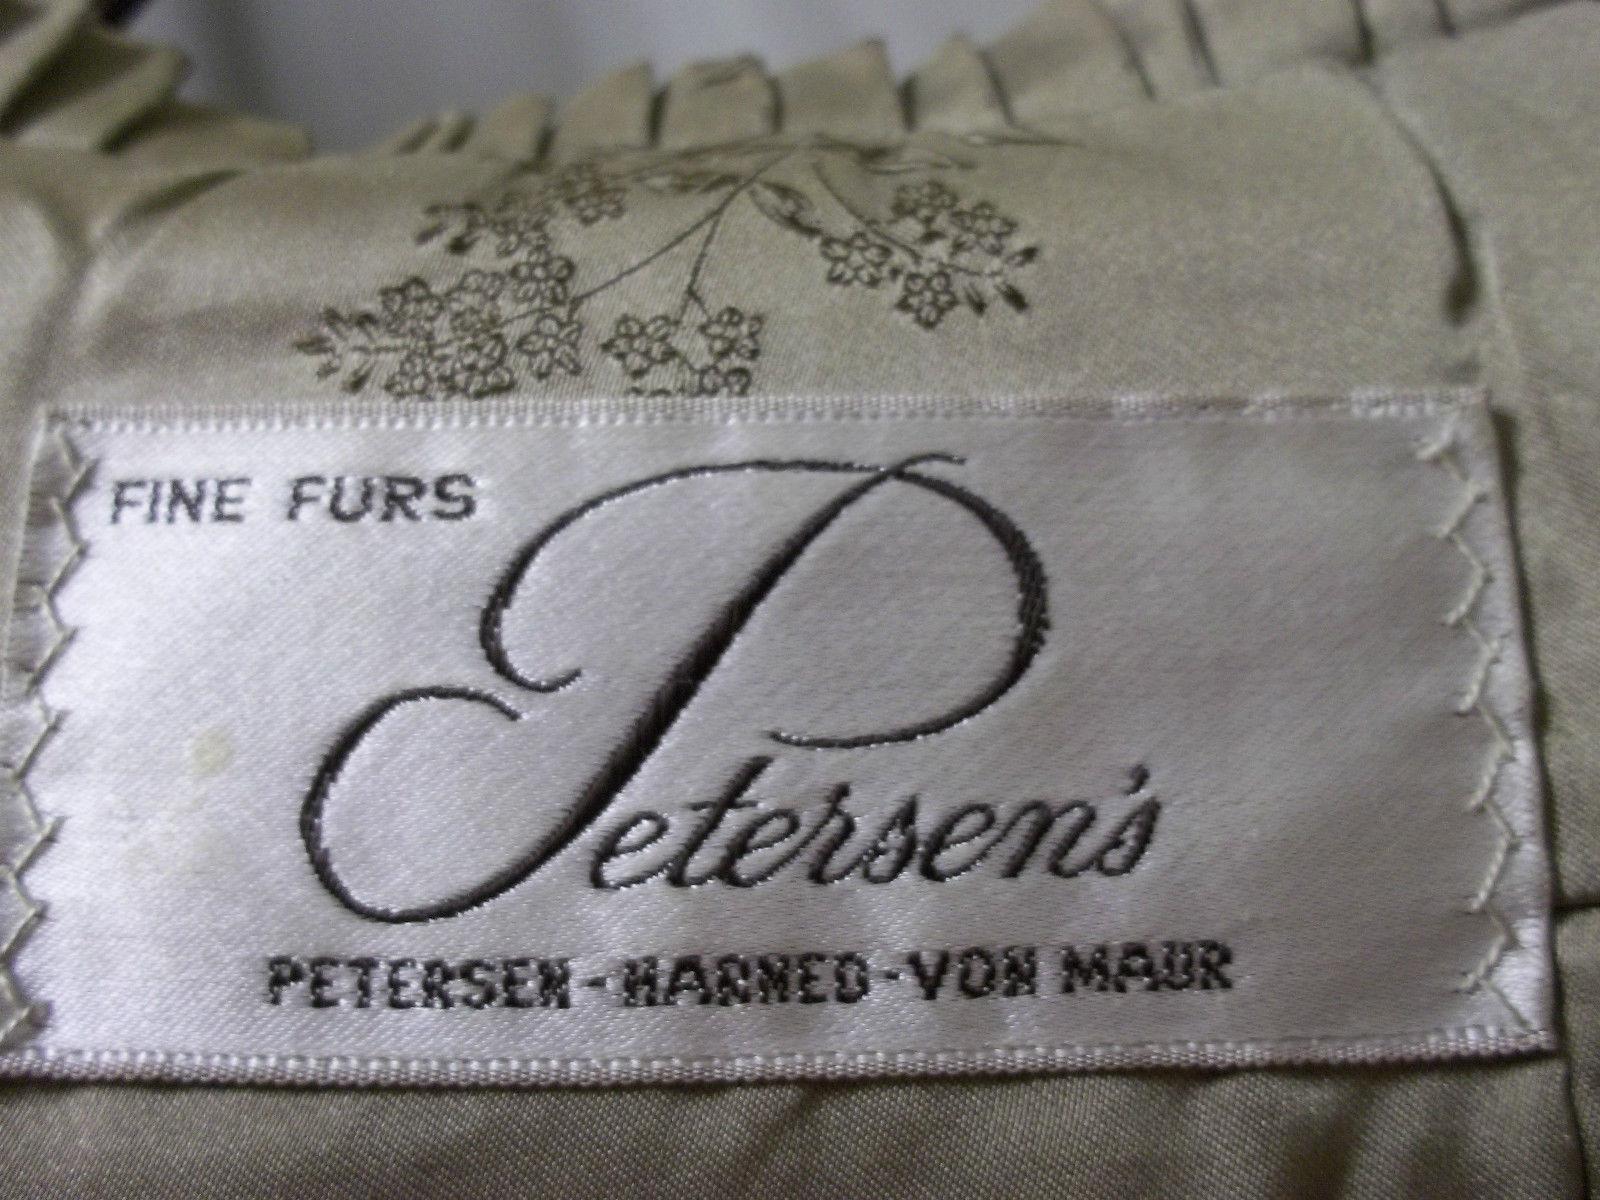 Luxurious Amazingly Soft Tan Mink Cape Petersen's Fine Furs Women's Medium image 5